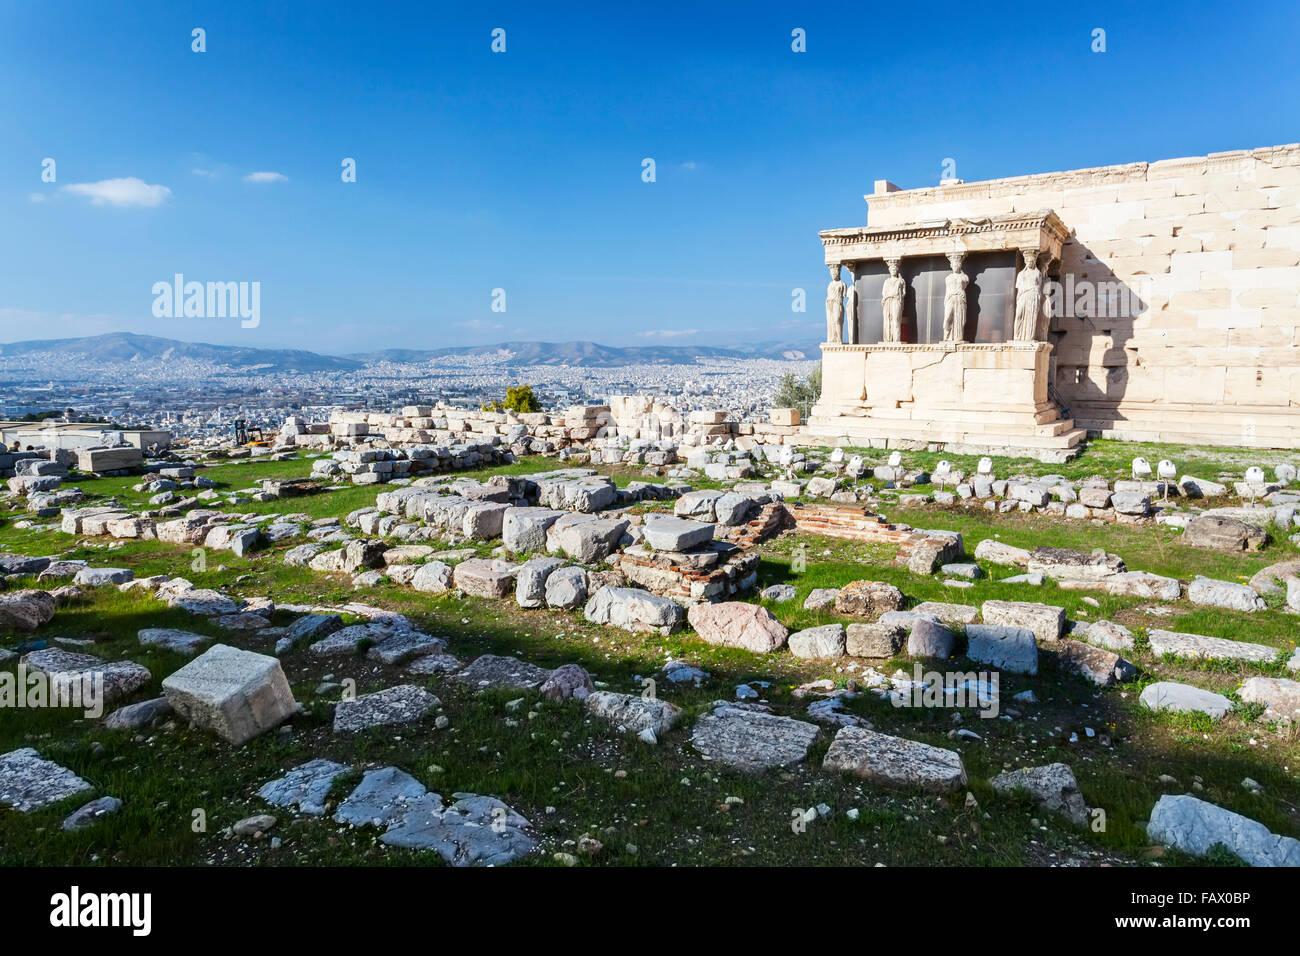 Caryatid Porch; Athens, Greece - Stock Image